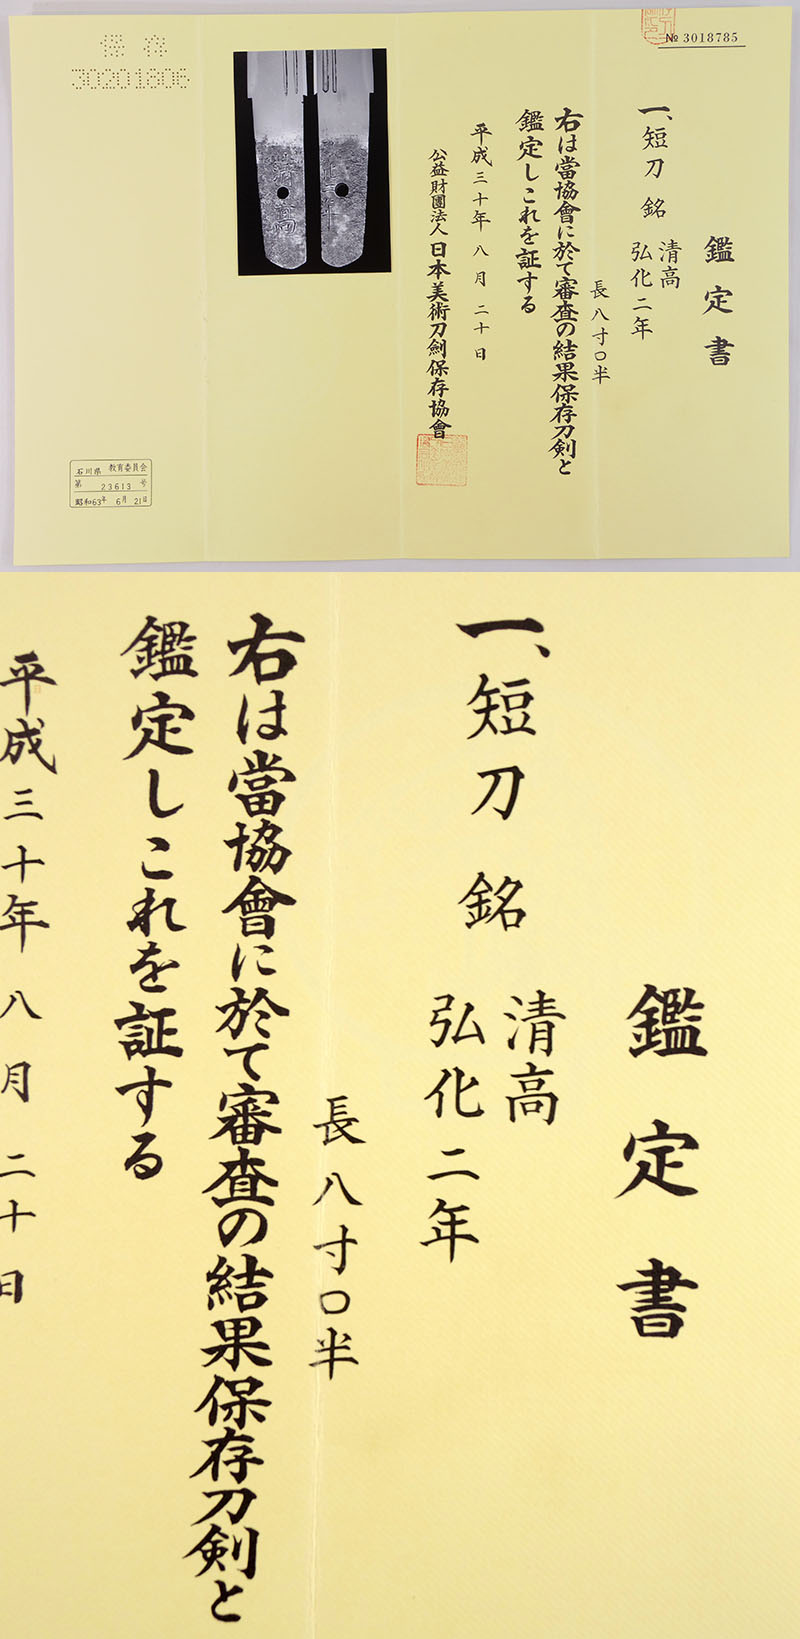 清高(新々刀・武州) Picture of Certificate